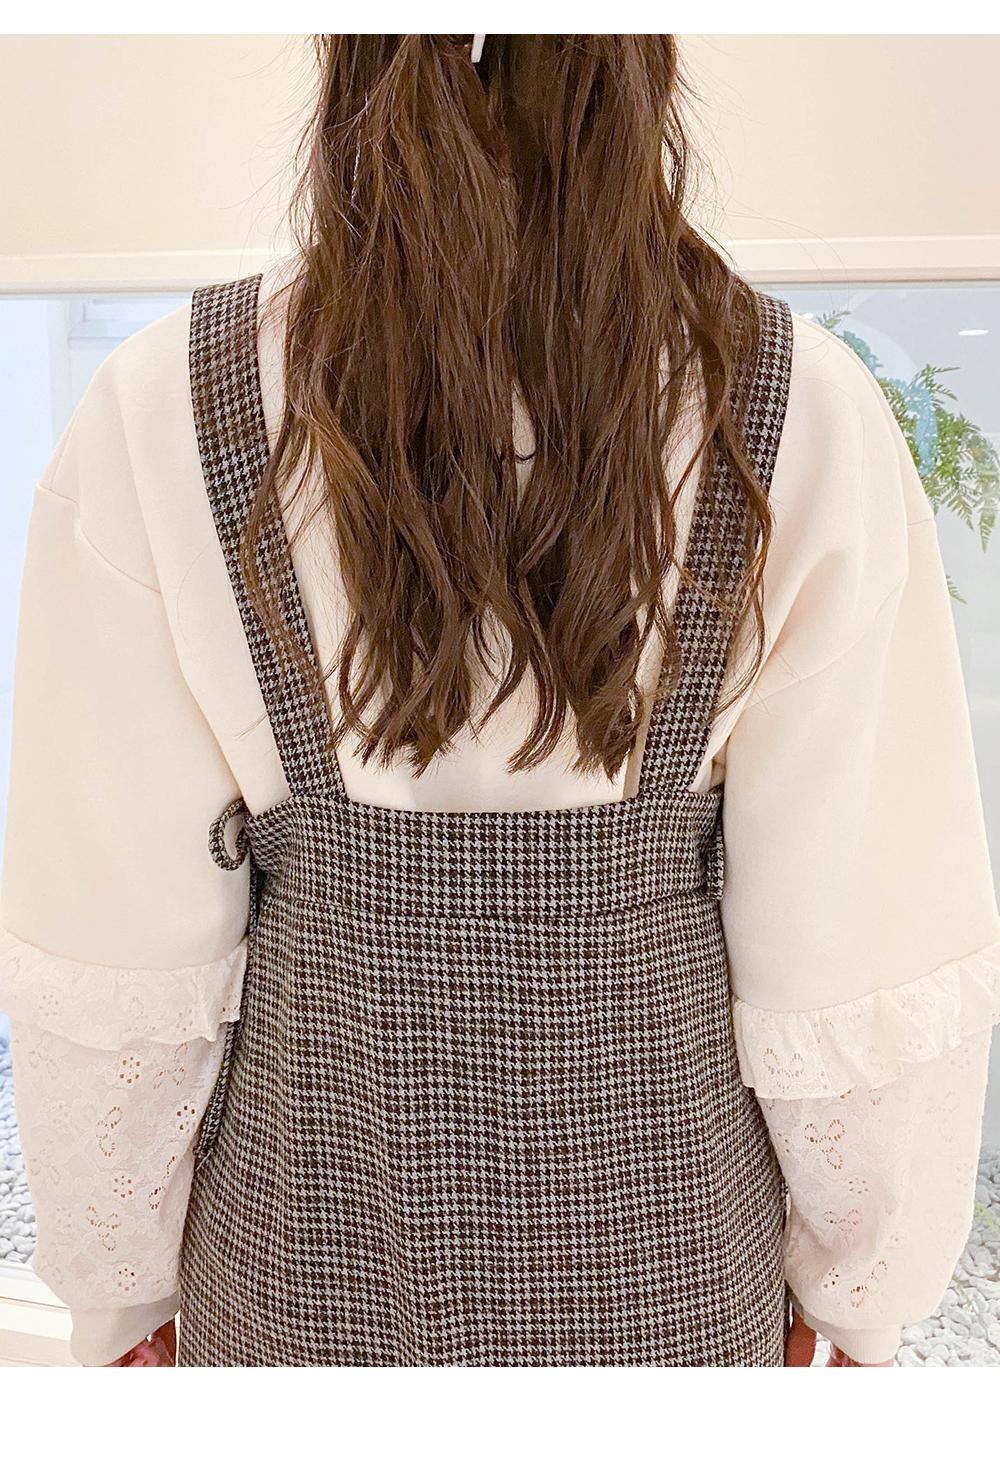 Big Size 66-99 Hershey Loose-fit ruffle Sweatshirt